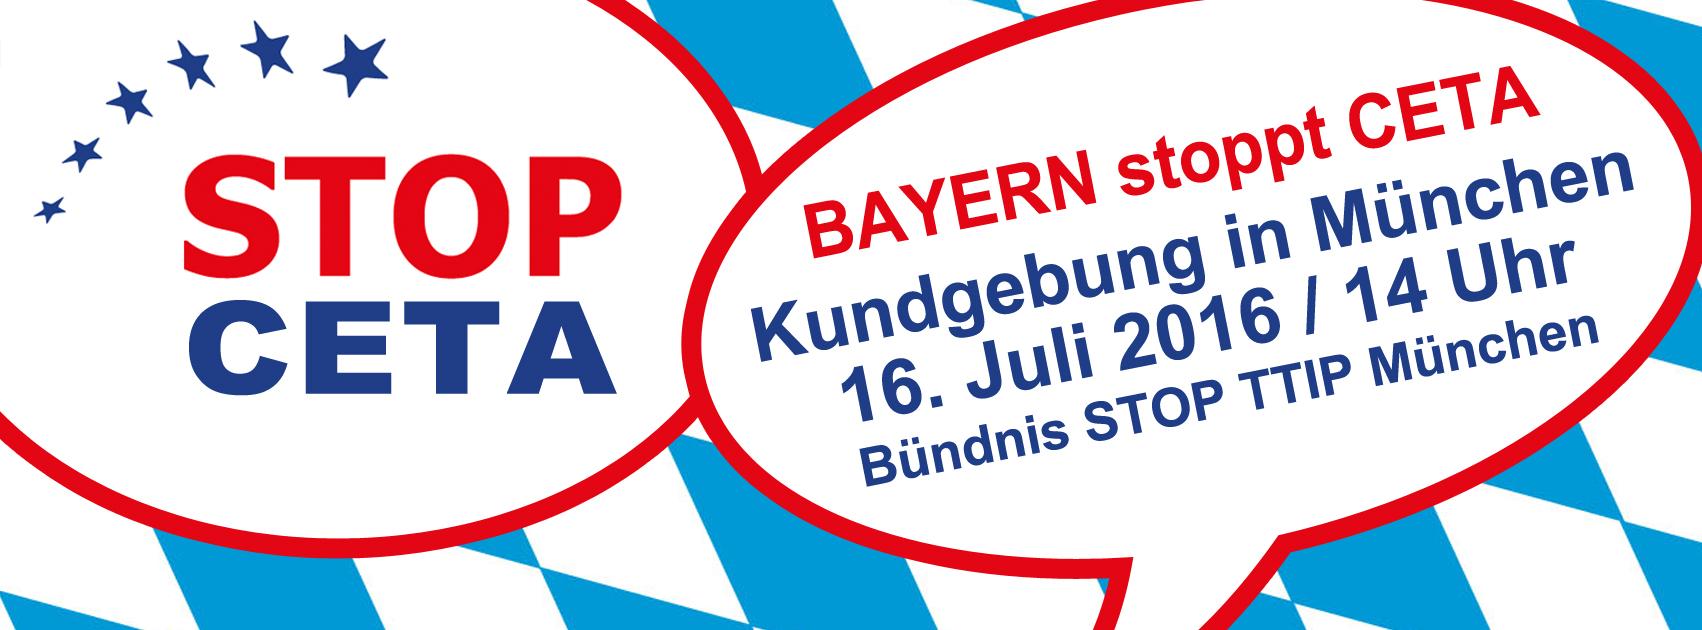 STOPP-TTIP-M-Facebook-Titelbild2